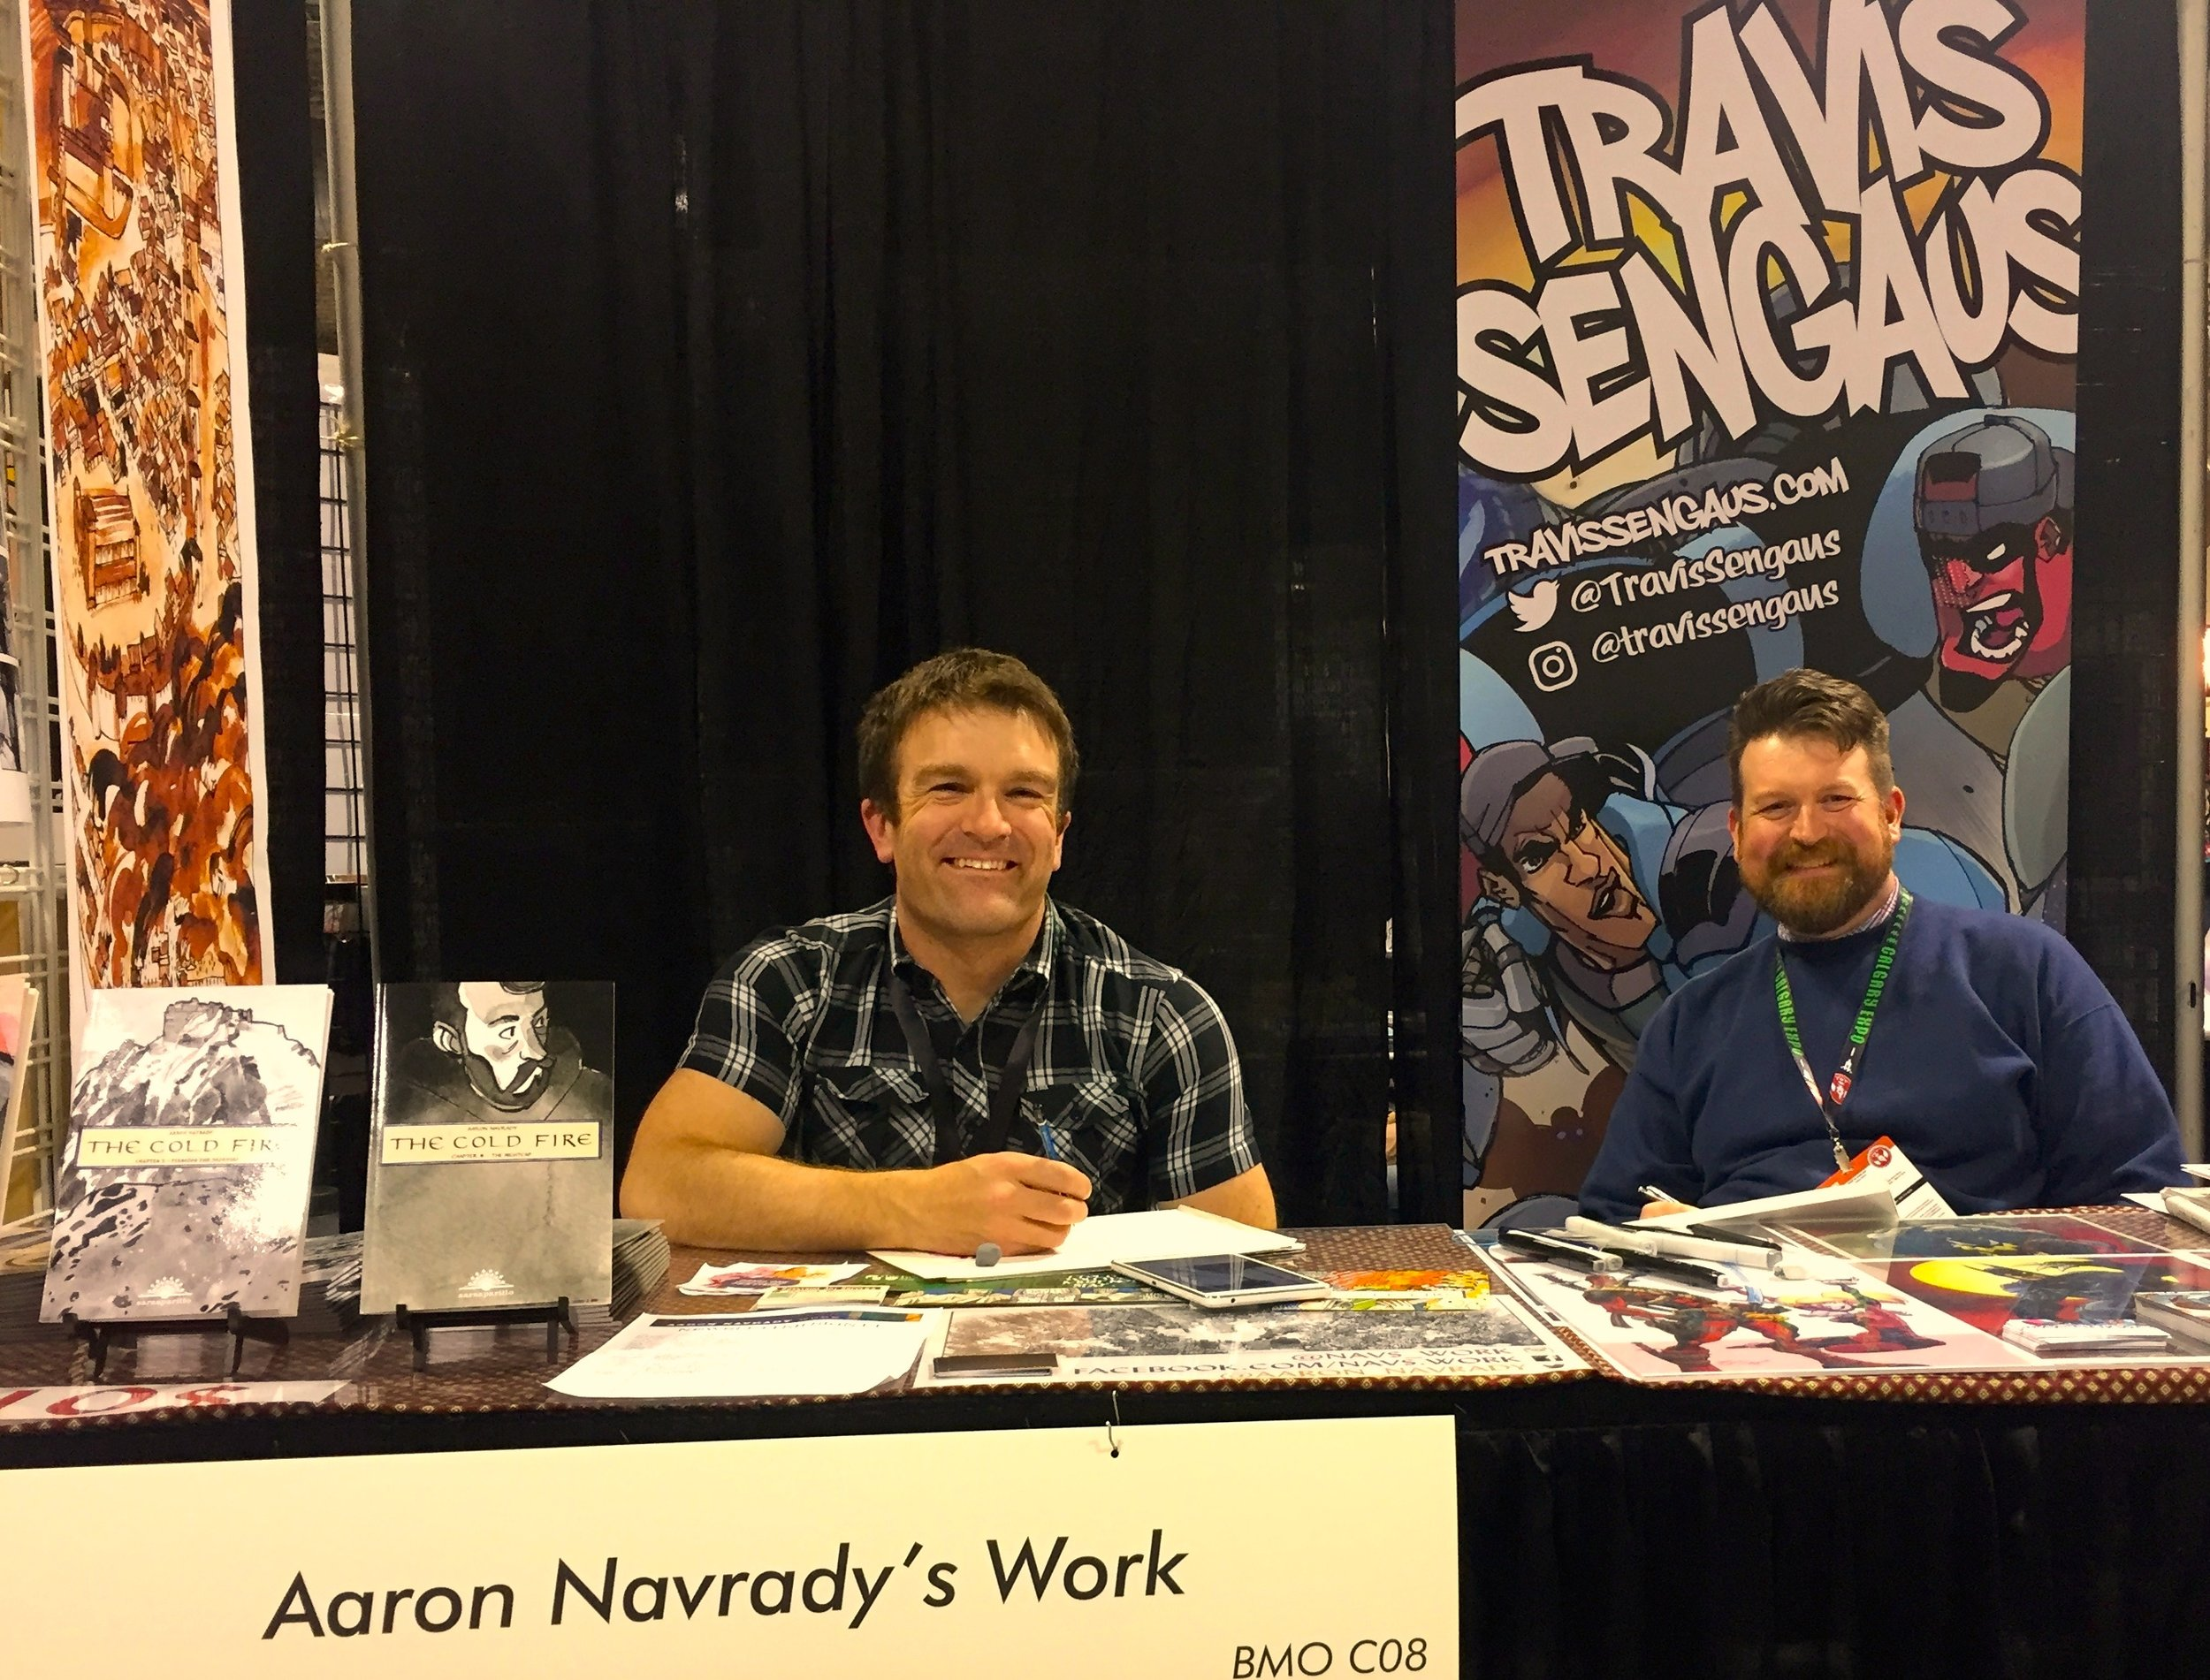 Aaron Navrady & Travis Sengaus - Booth C08  (Photo credit: Chris Doucher/GeekNerdNet.com)